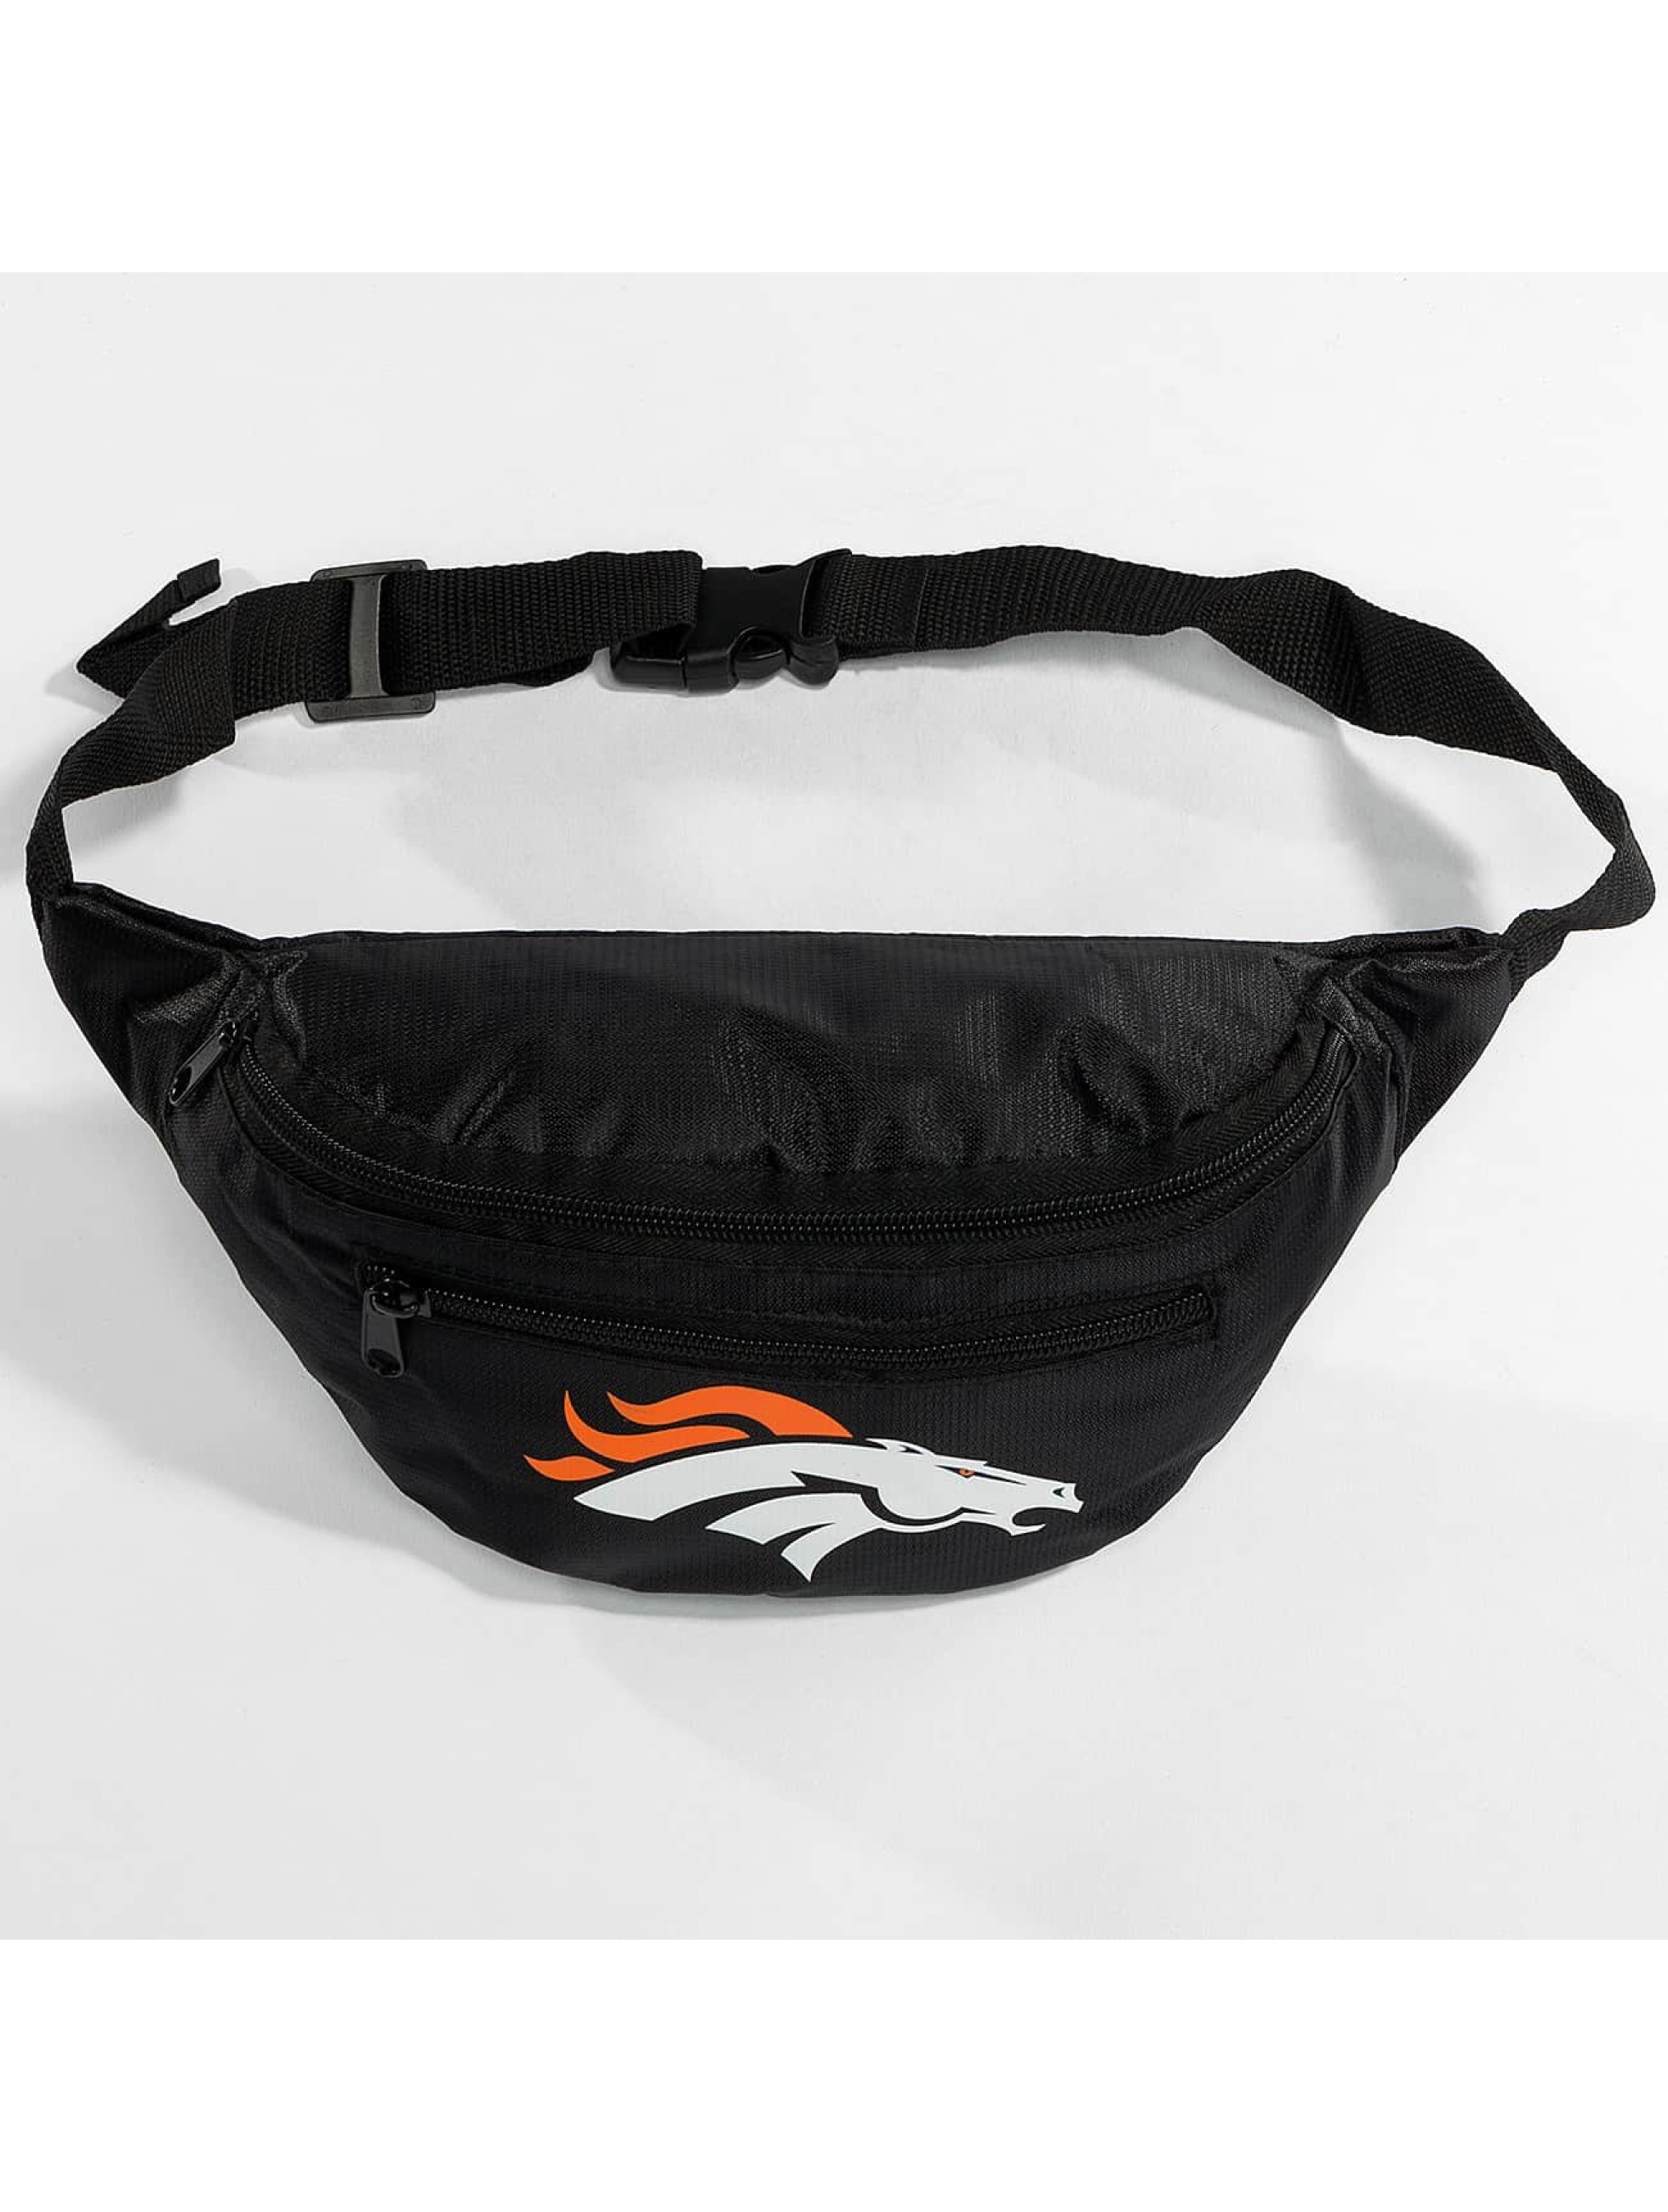 Forever Collectibles Tasche NFL Denver Broncos schwarz